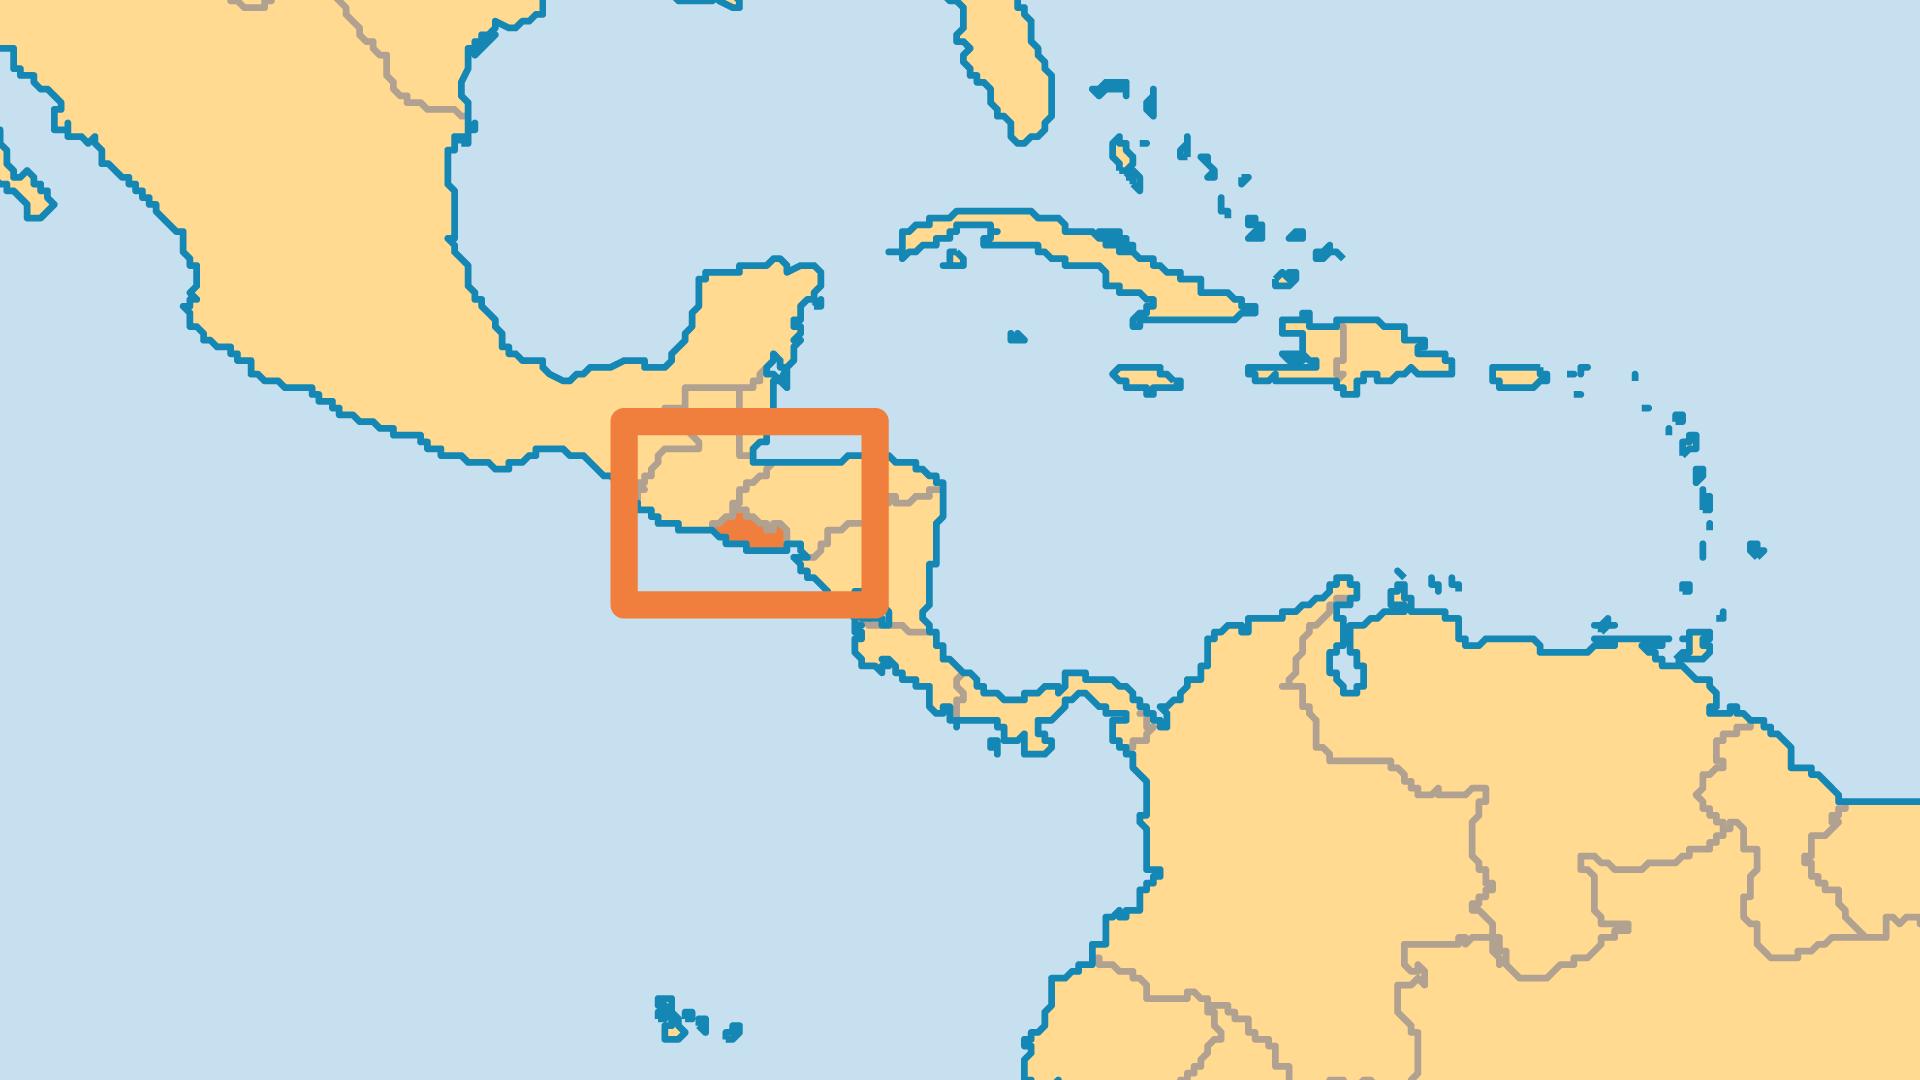 Locator Map for El Salvador